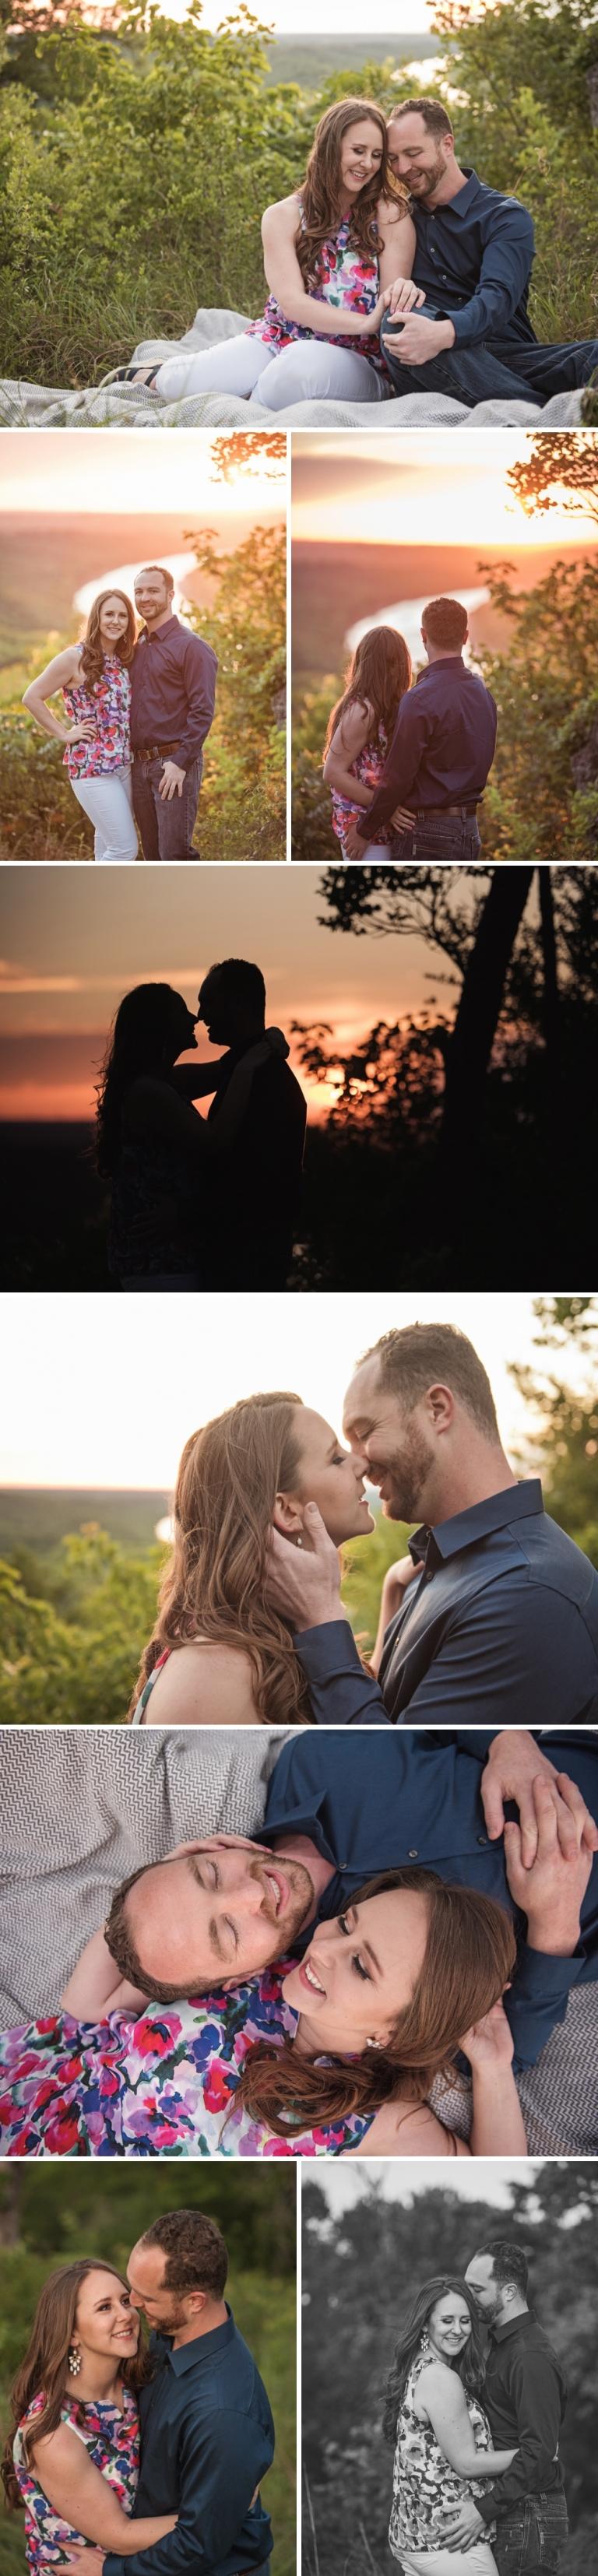 Mckinney Engagement Photographer